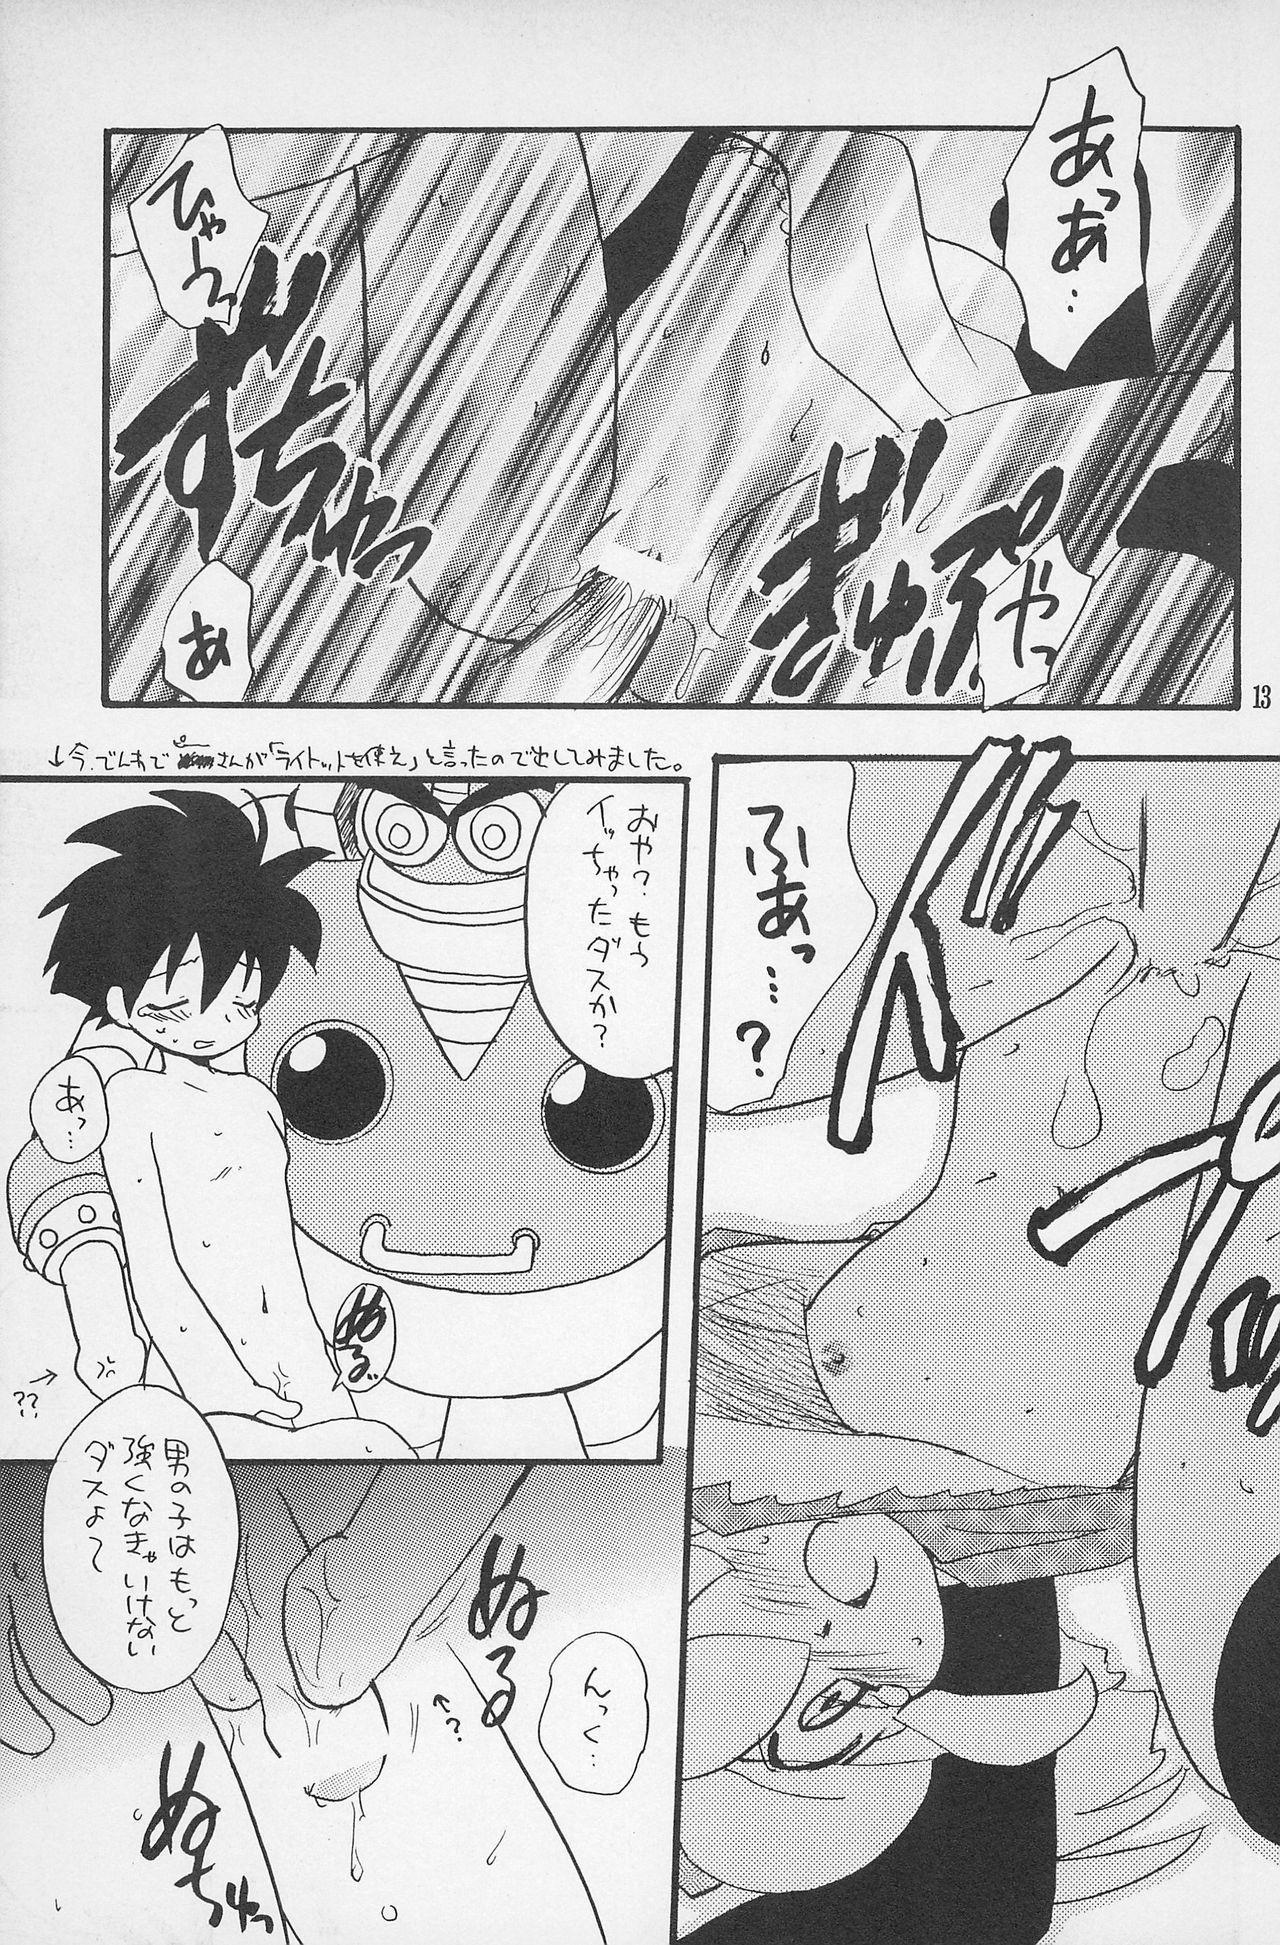 Super Loli Loli Daisakusen! 14